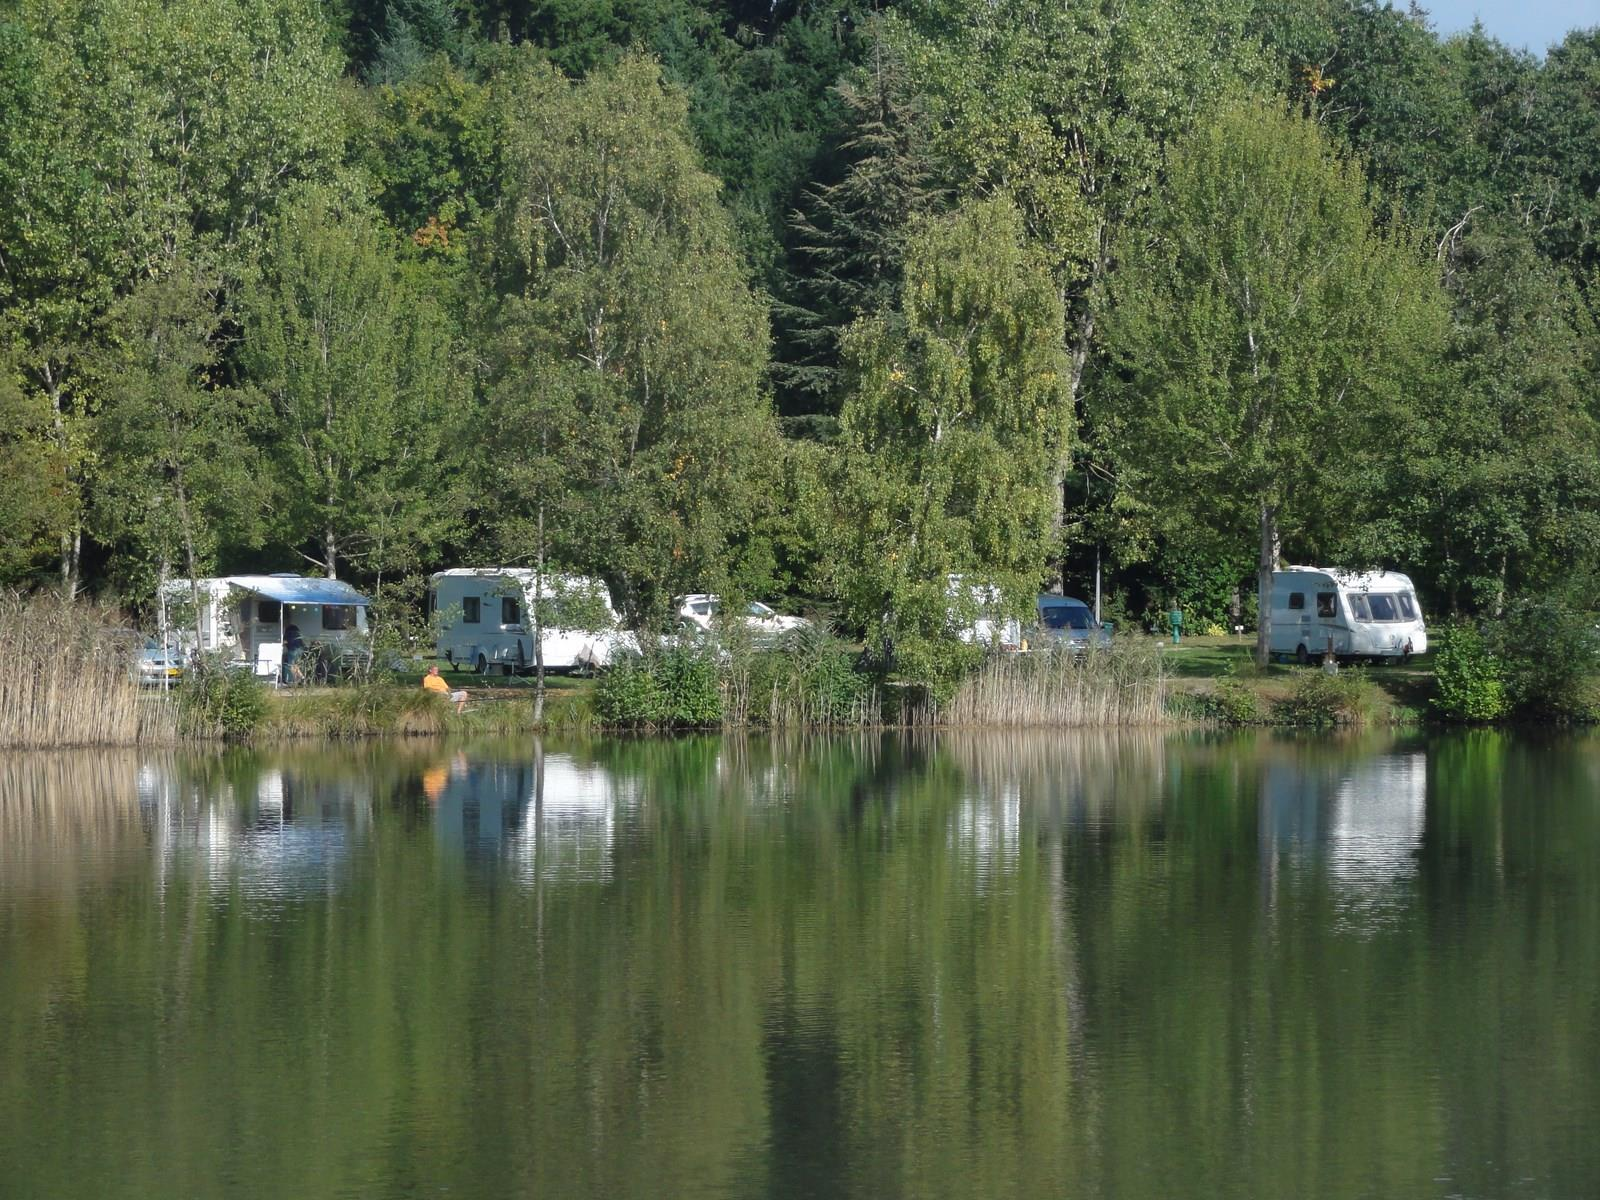 Emplacement - Emplacement Auto Tente/Caravane/Camping Car - Camping La Grande Sologne